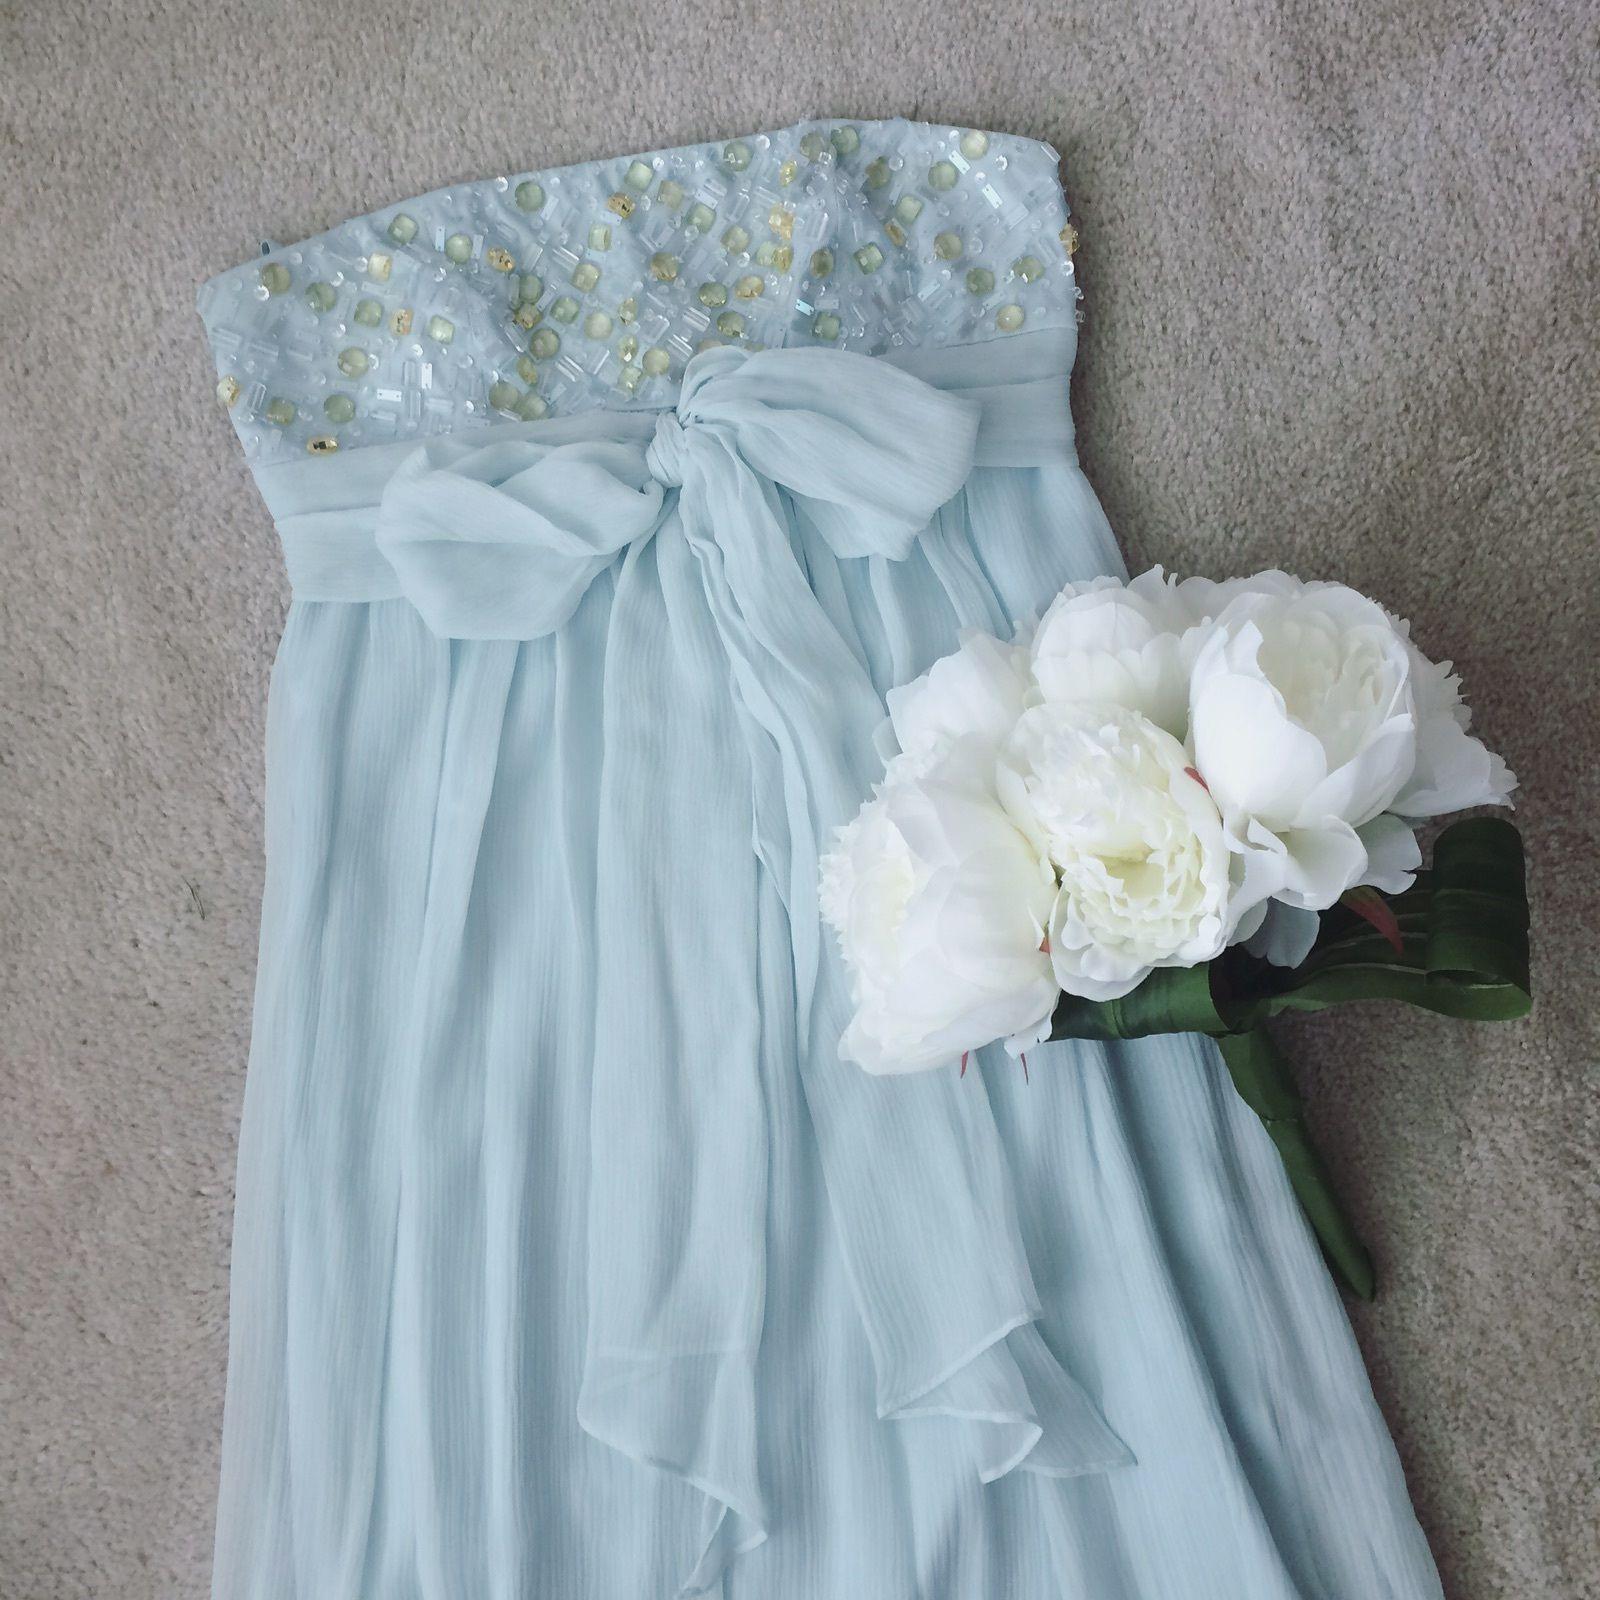 Awesome bcbg maxazria formal dress size foam green homecoming